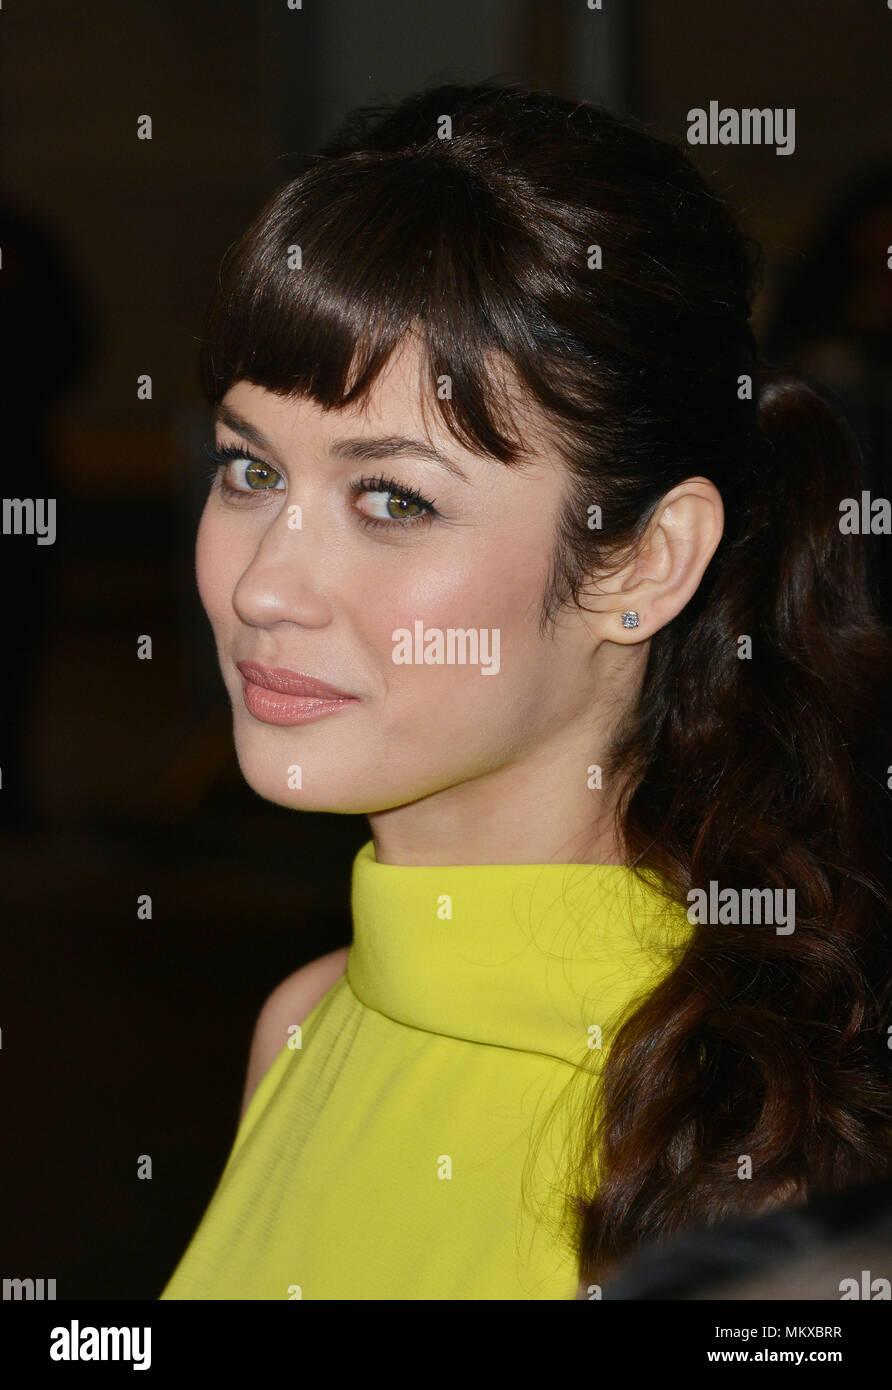 Celebrity Olga Rom nudes (22 photos), Tits, Cleavage, Twitter, braless 2015